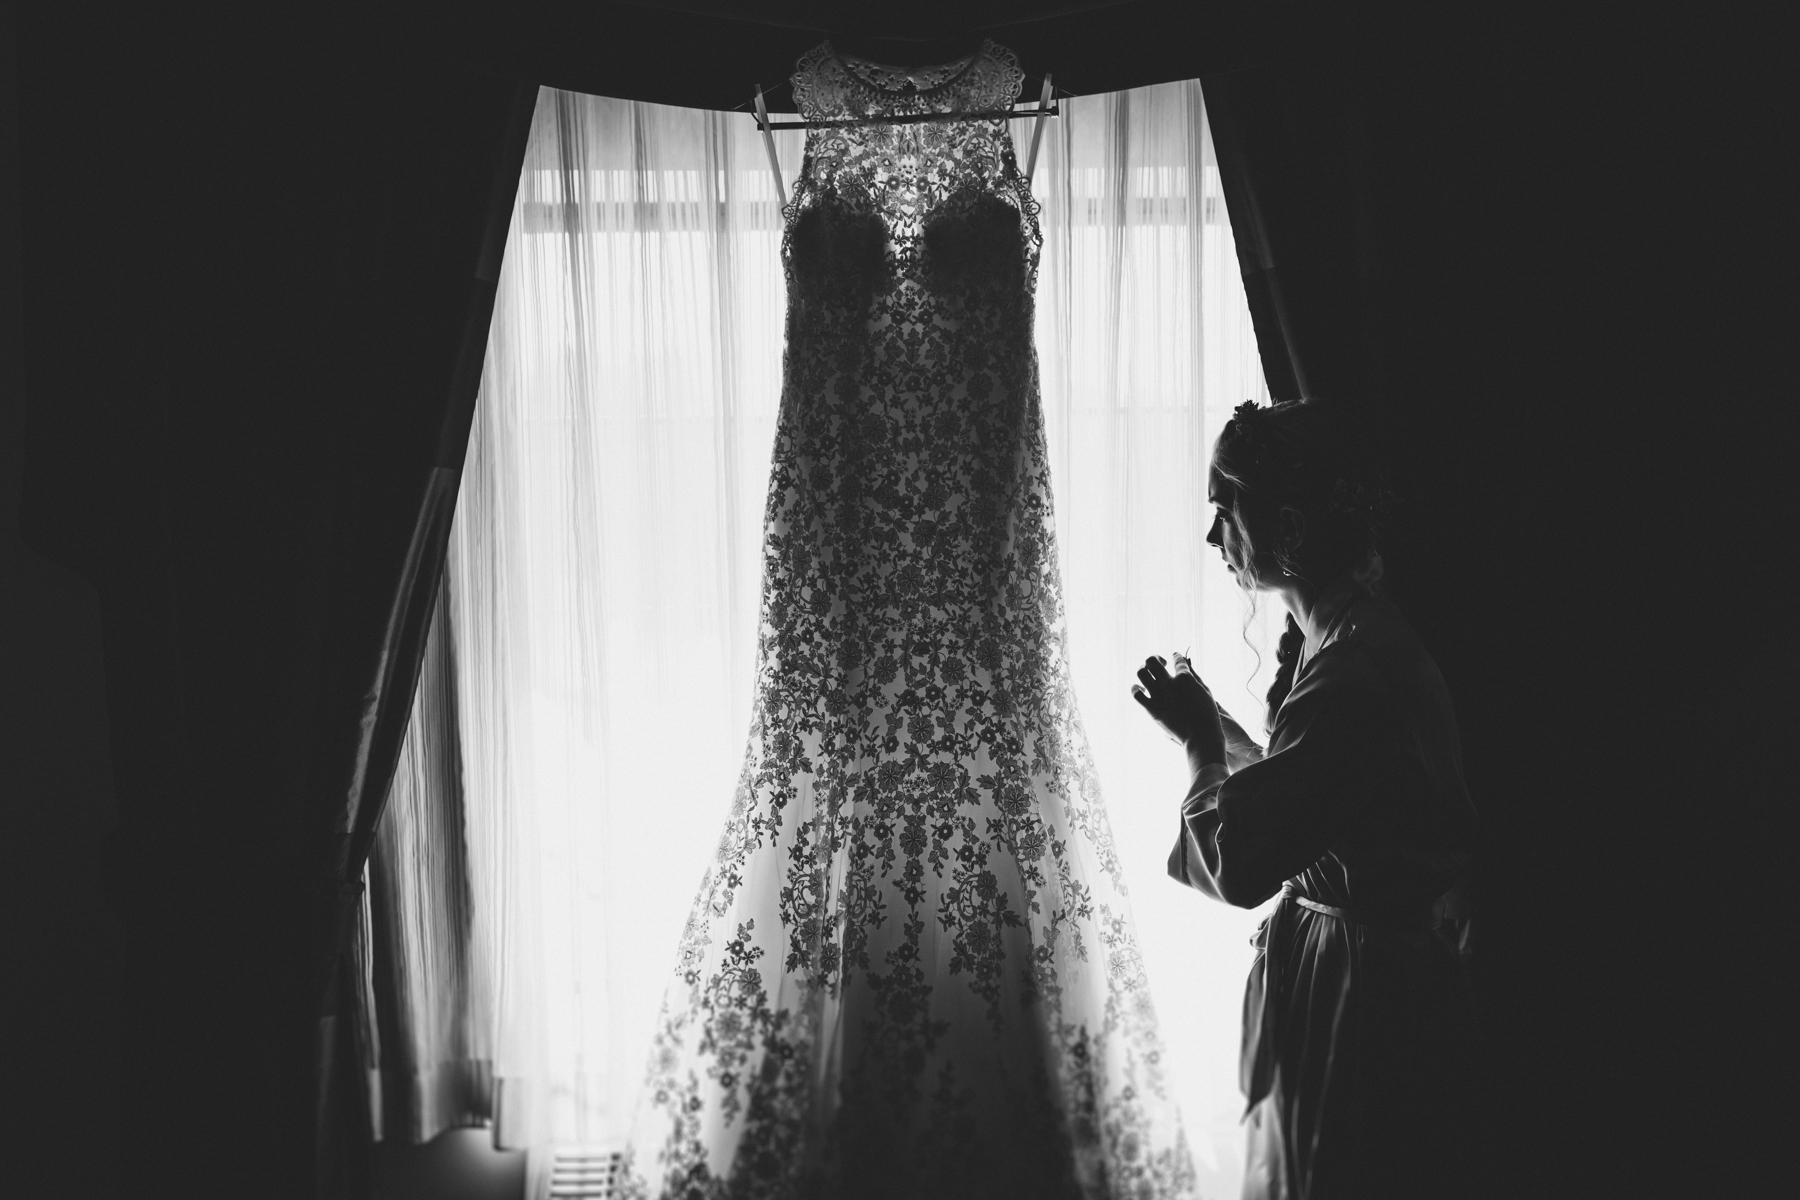 Long-Island-Documentary-Wedding-Photography-Summer-Tent-Wedding-in-New-York-9.jpg